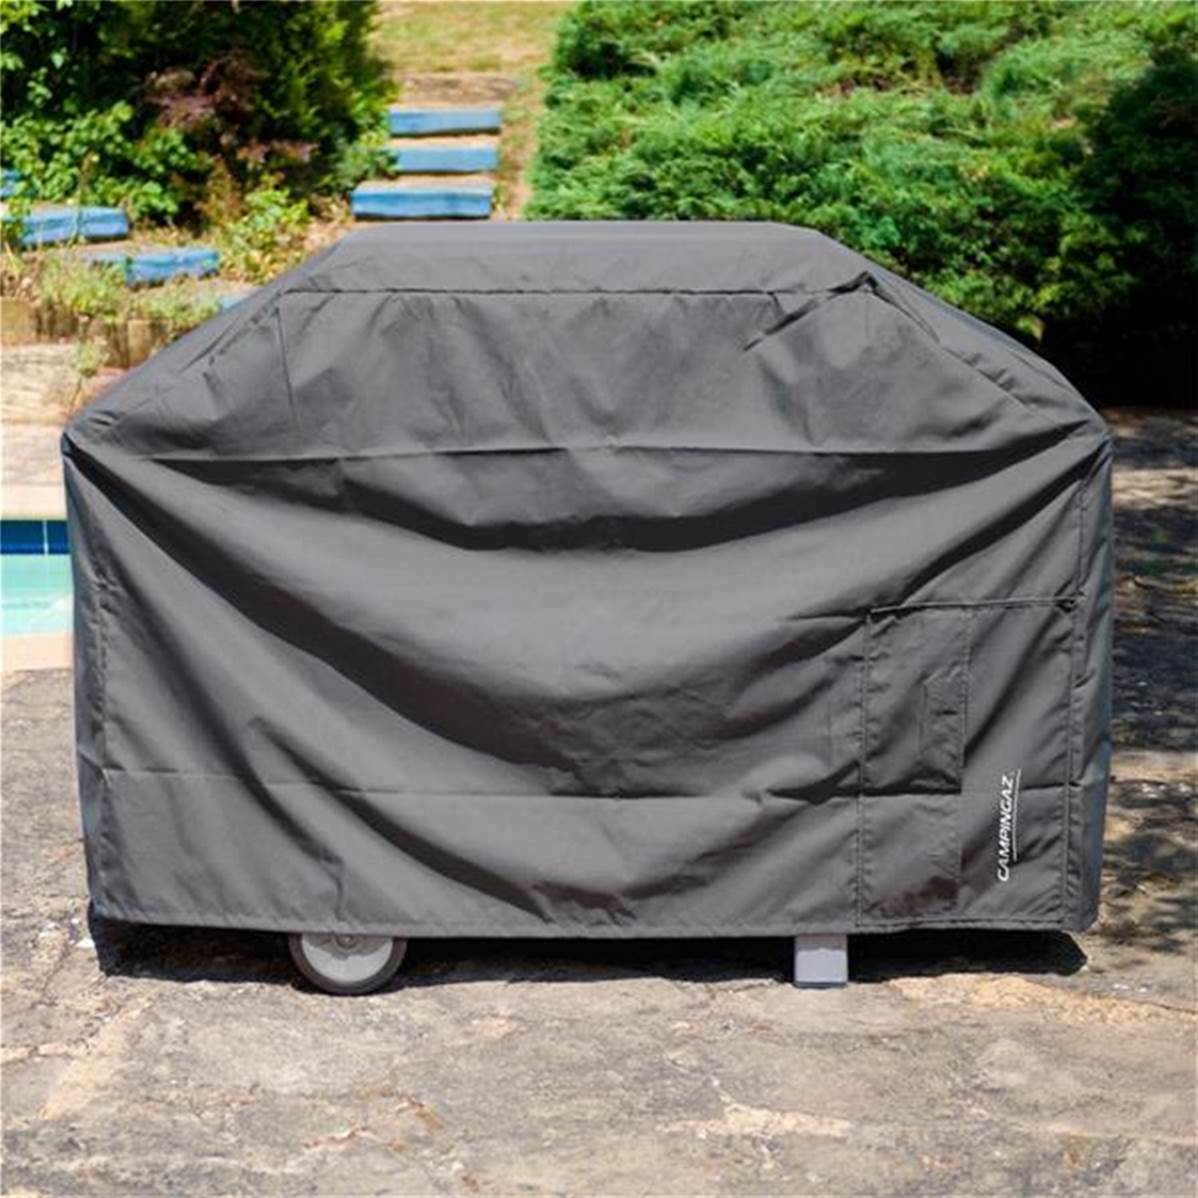 housse respirante premium pour barbecue et plancha ex exb. Black Bedroom Furniture Sets. Home Design Ideas